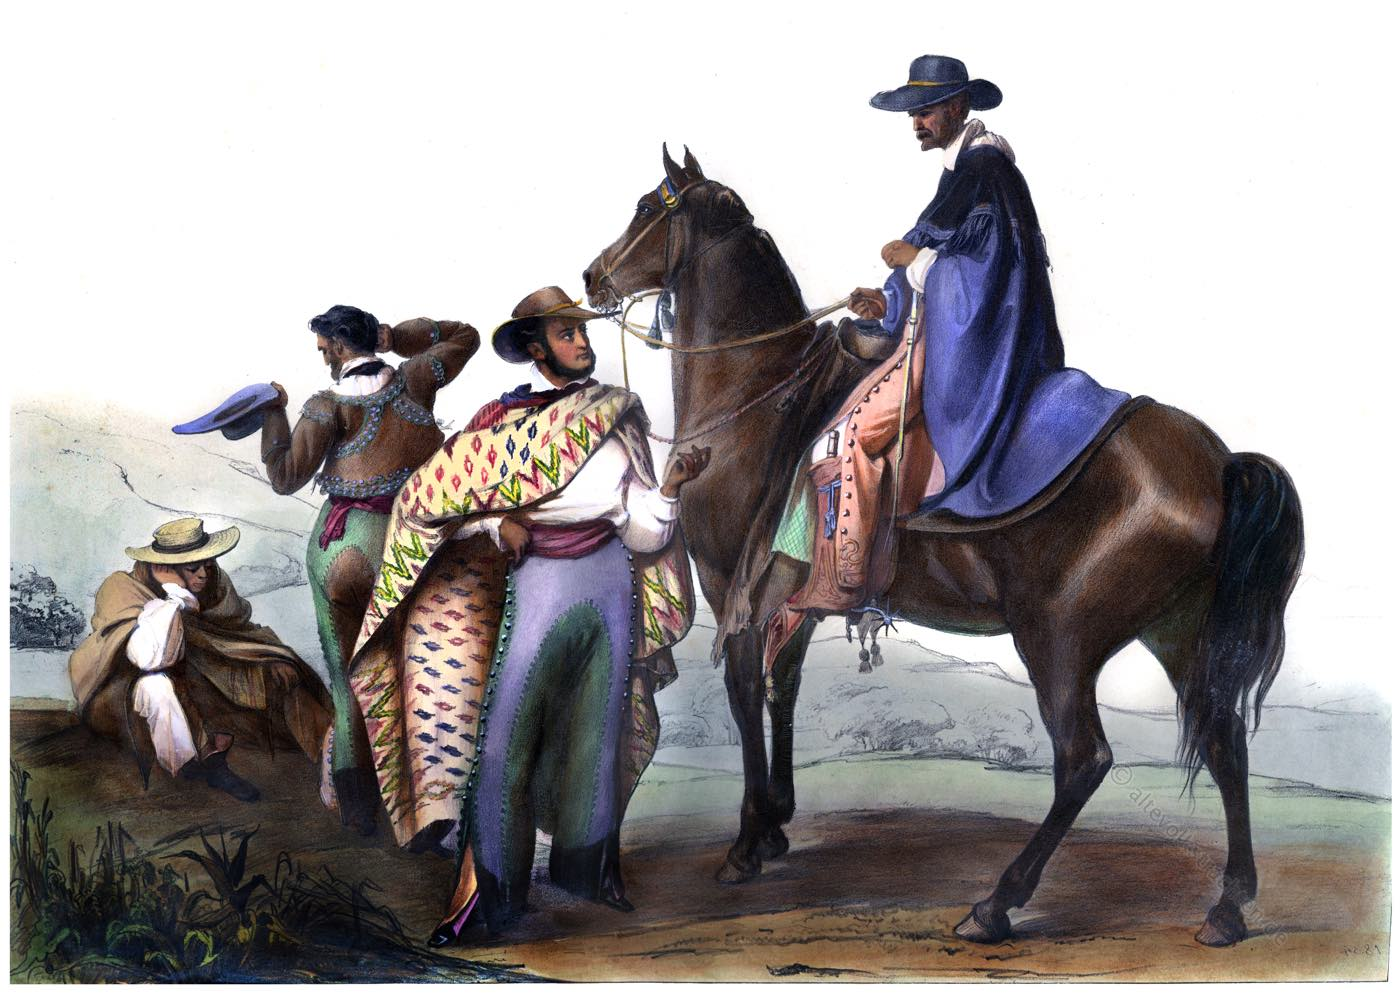 mexiko, rancheros, kostüme, kleidung, spanisch, Carl Nebel,